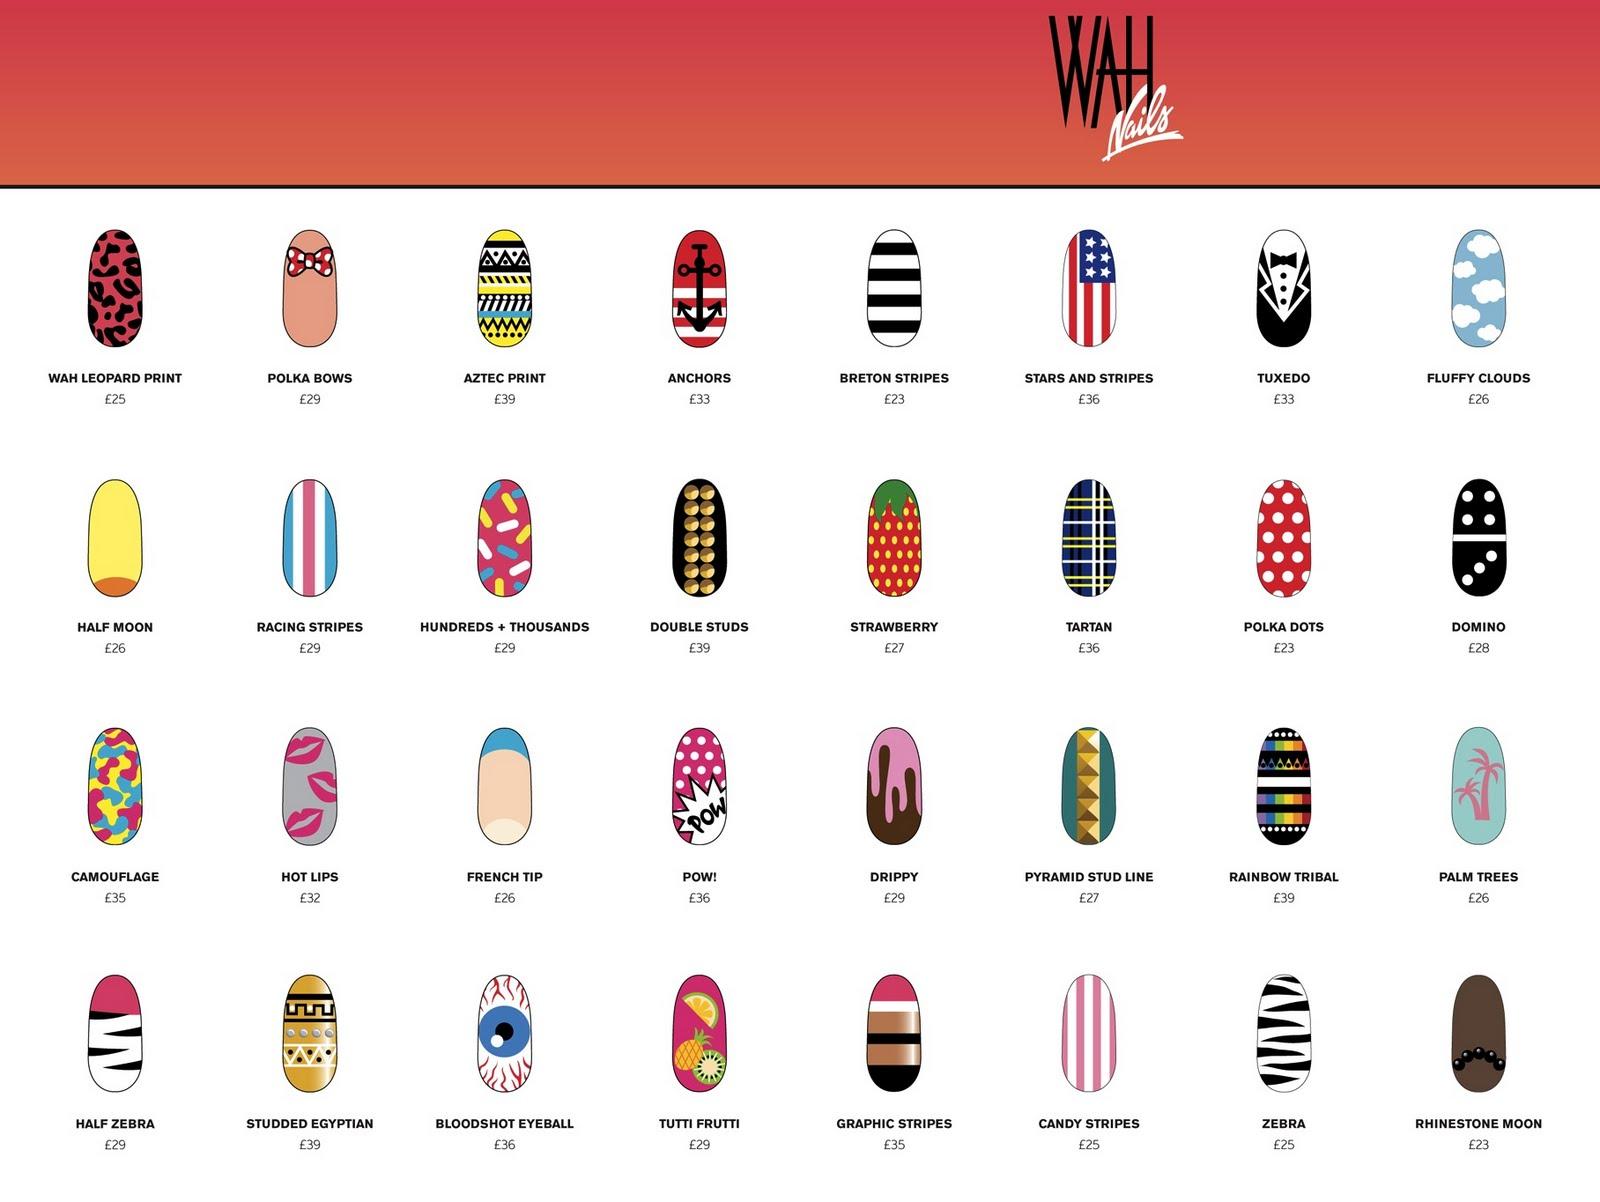 Charmant Wah Nägel London Fotos - Nagellack-Design-Ideen ...